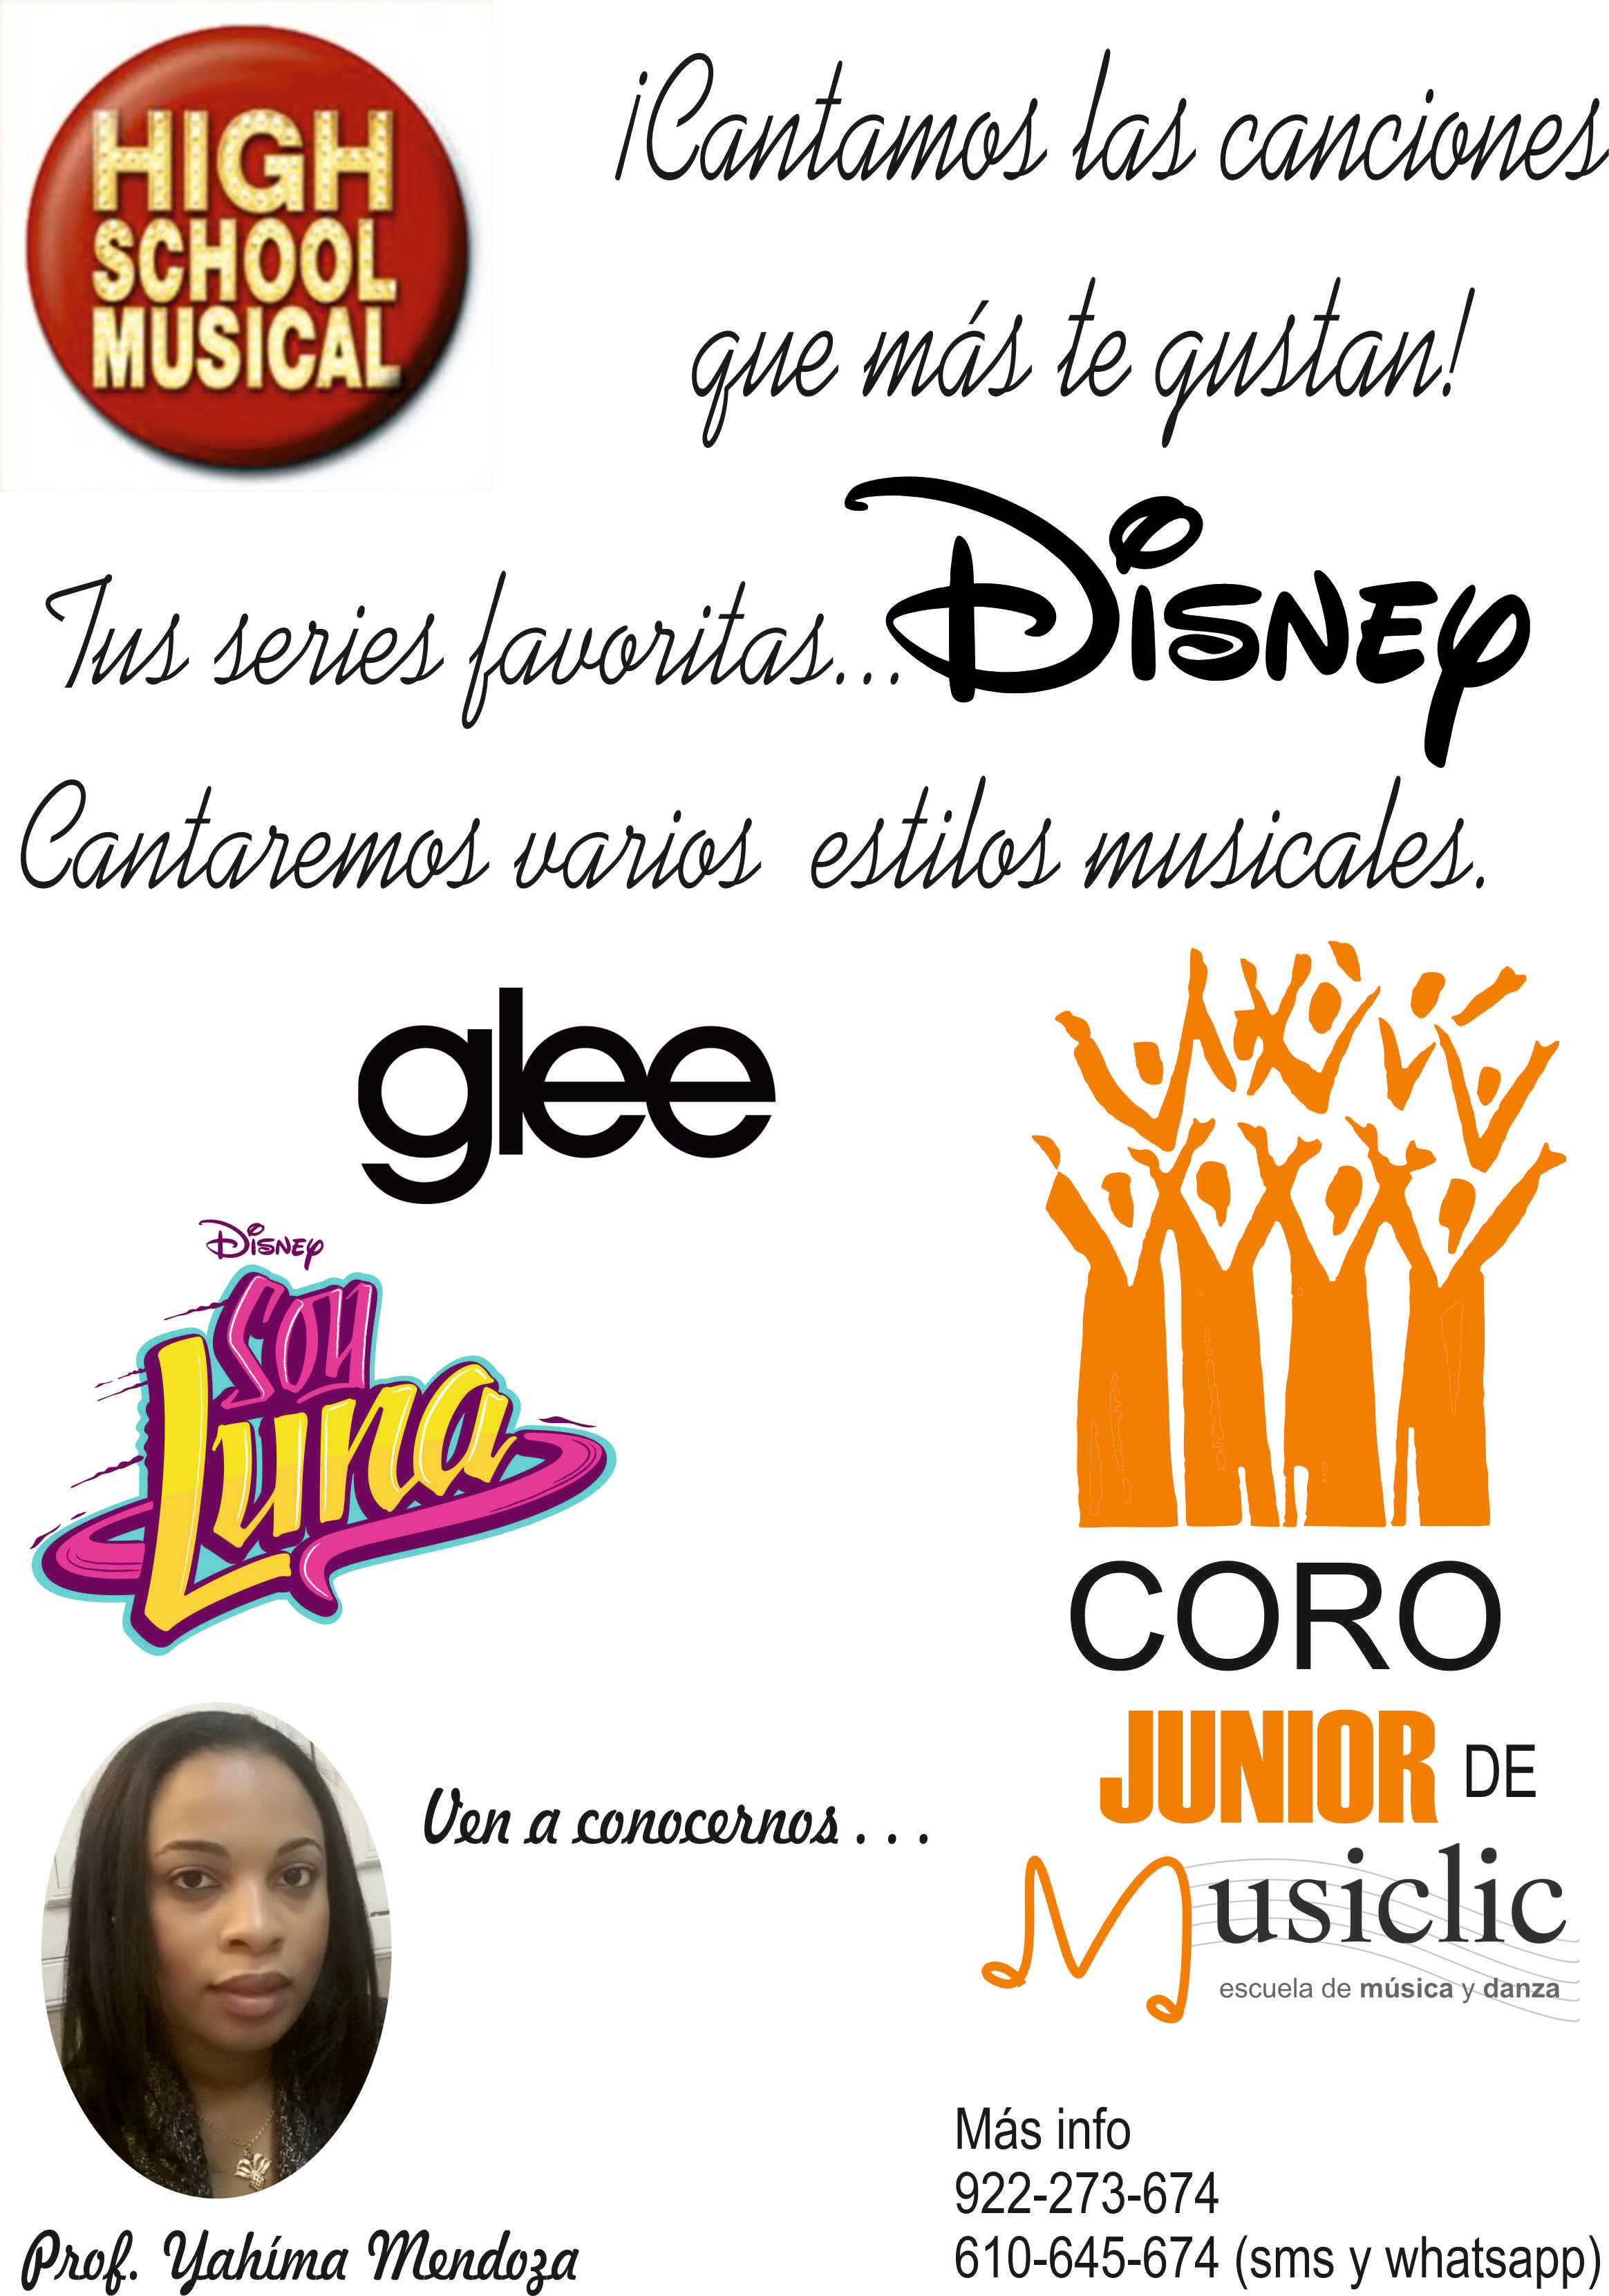 Coro Junior